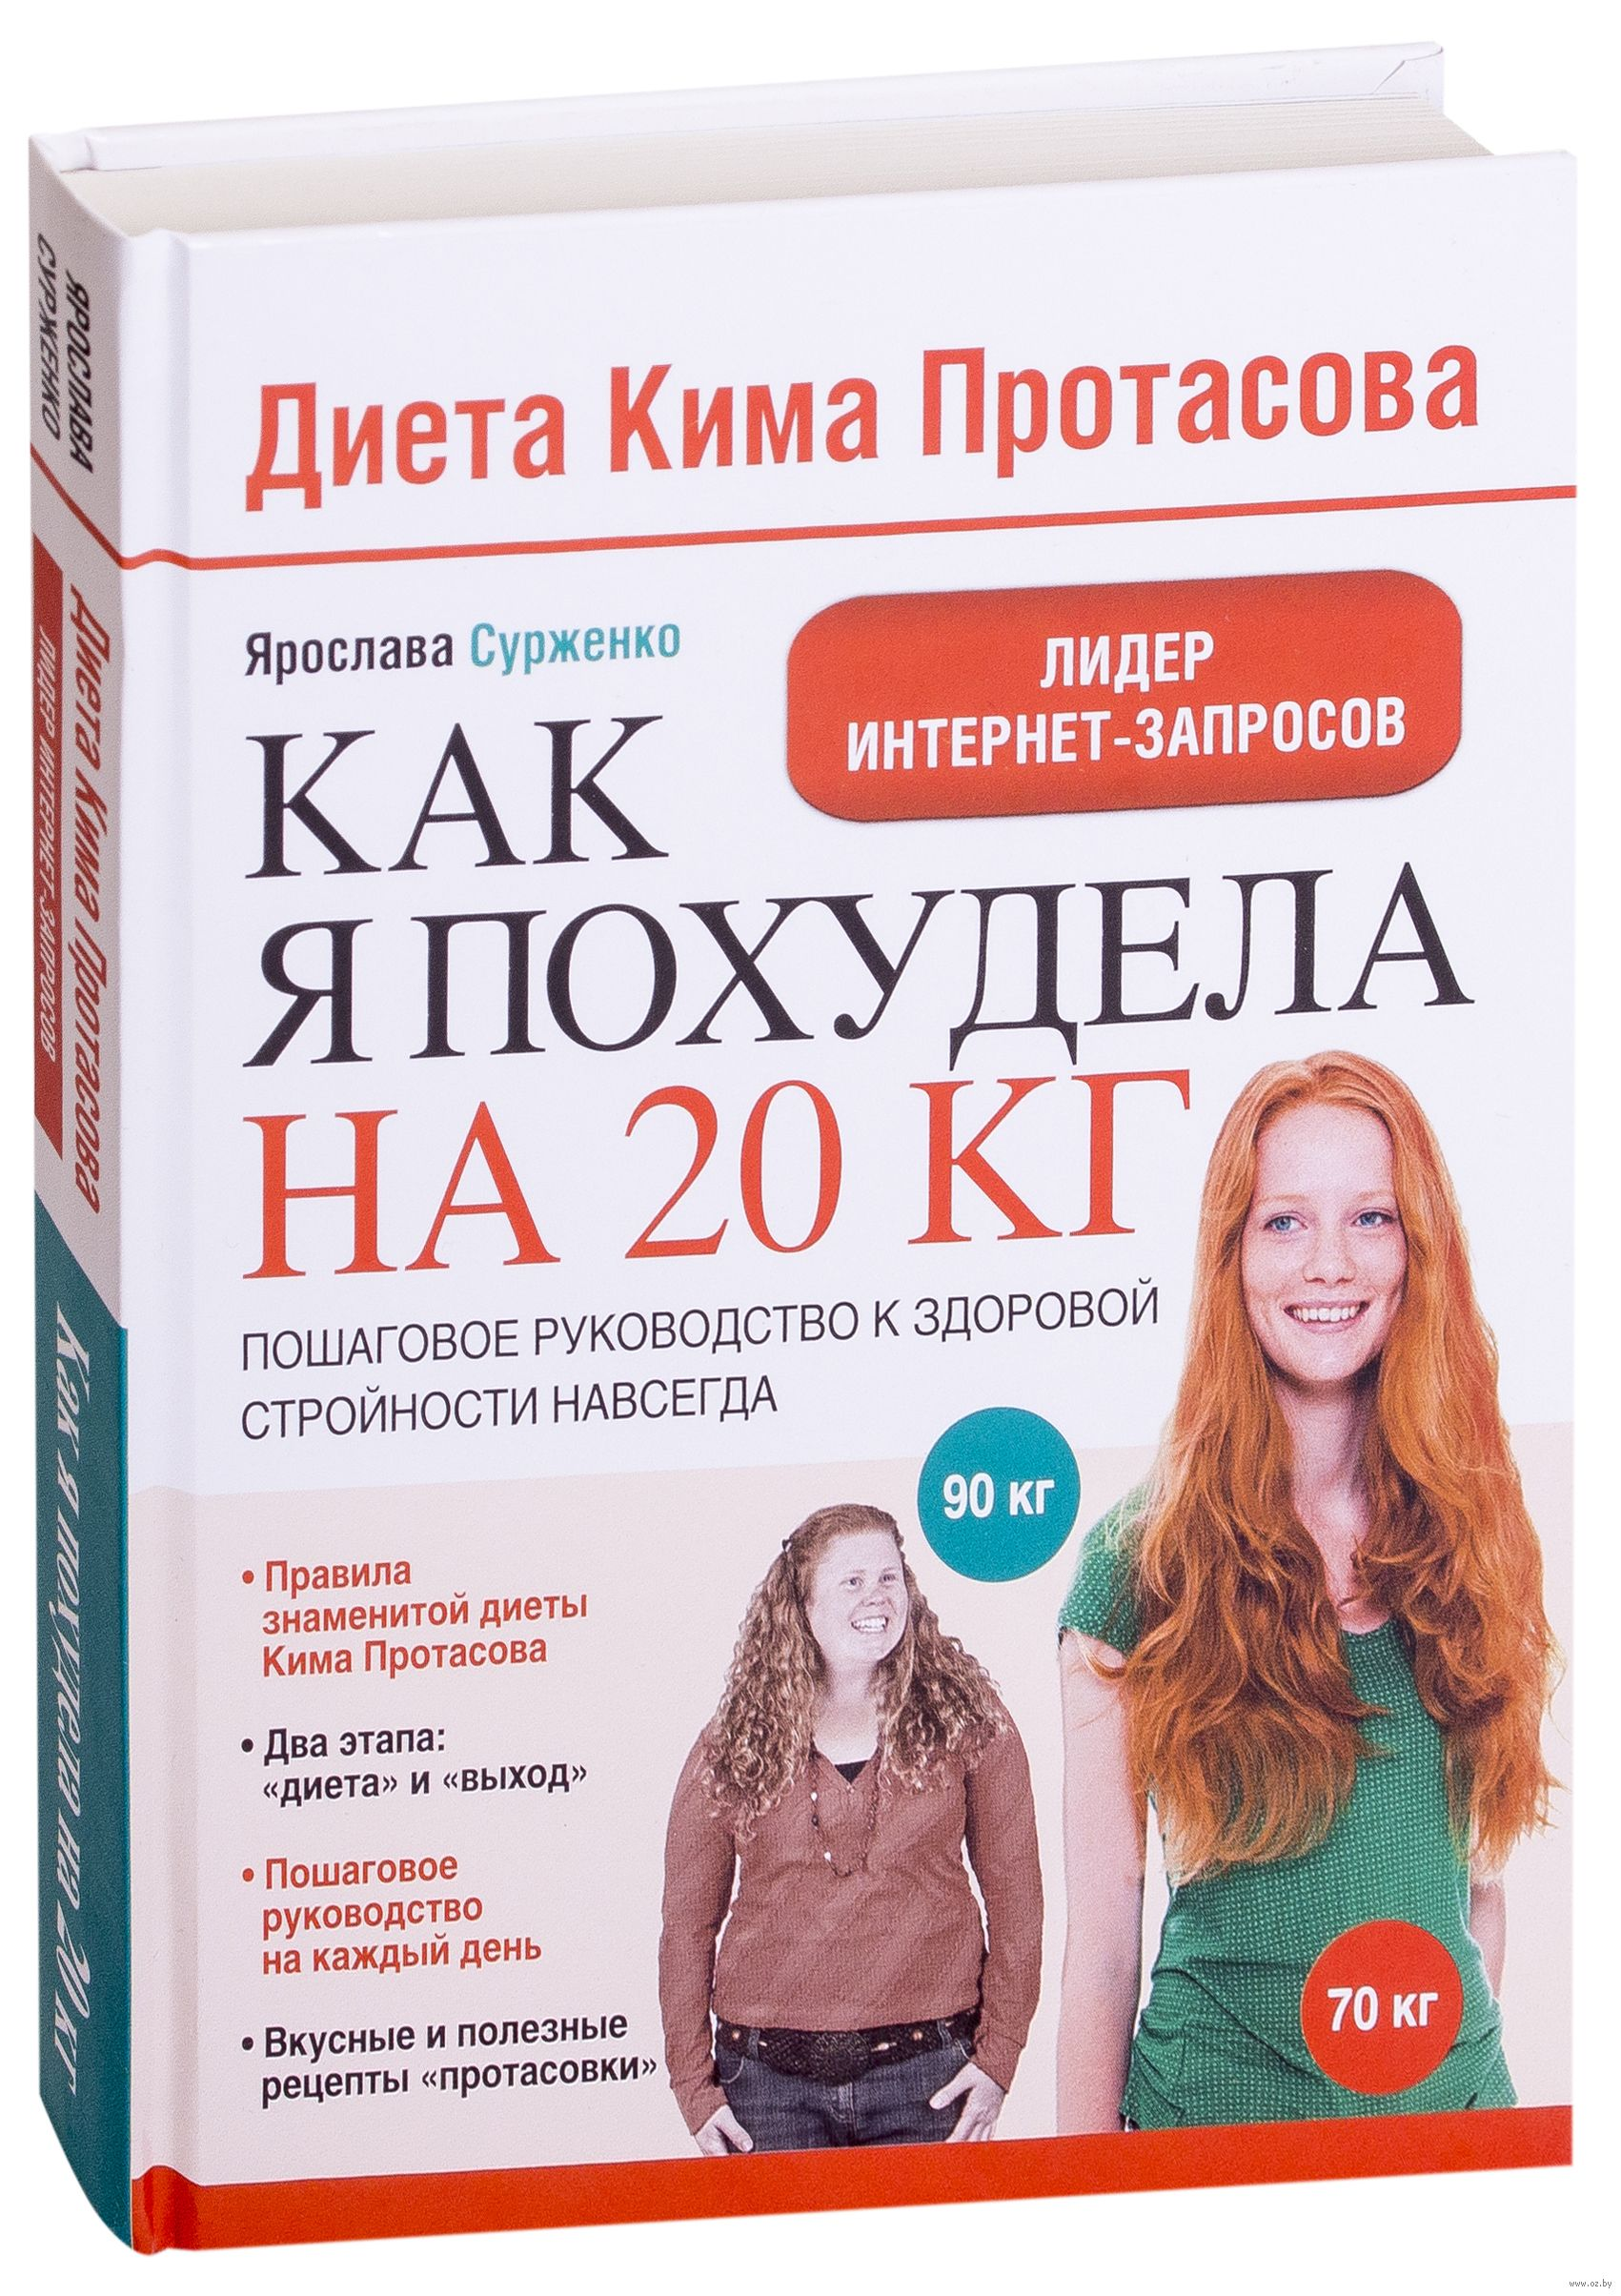 Похудение На Диете Протасова.